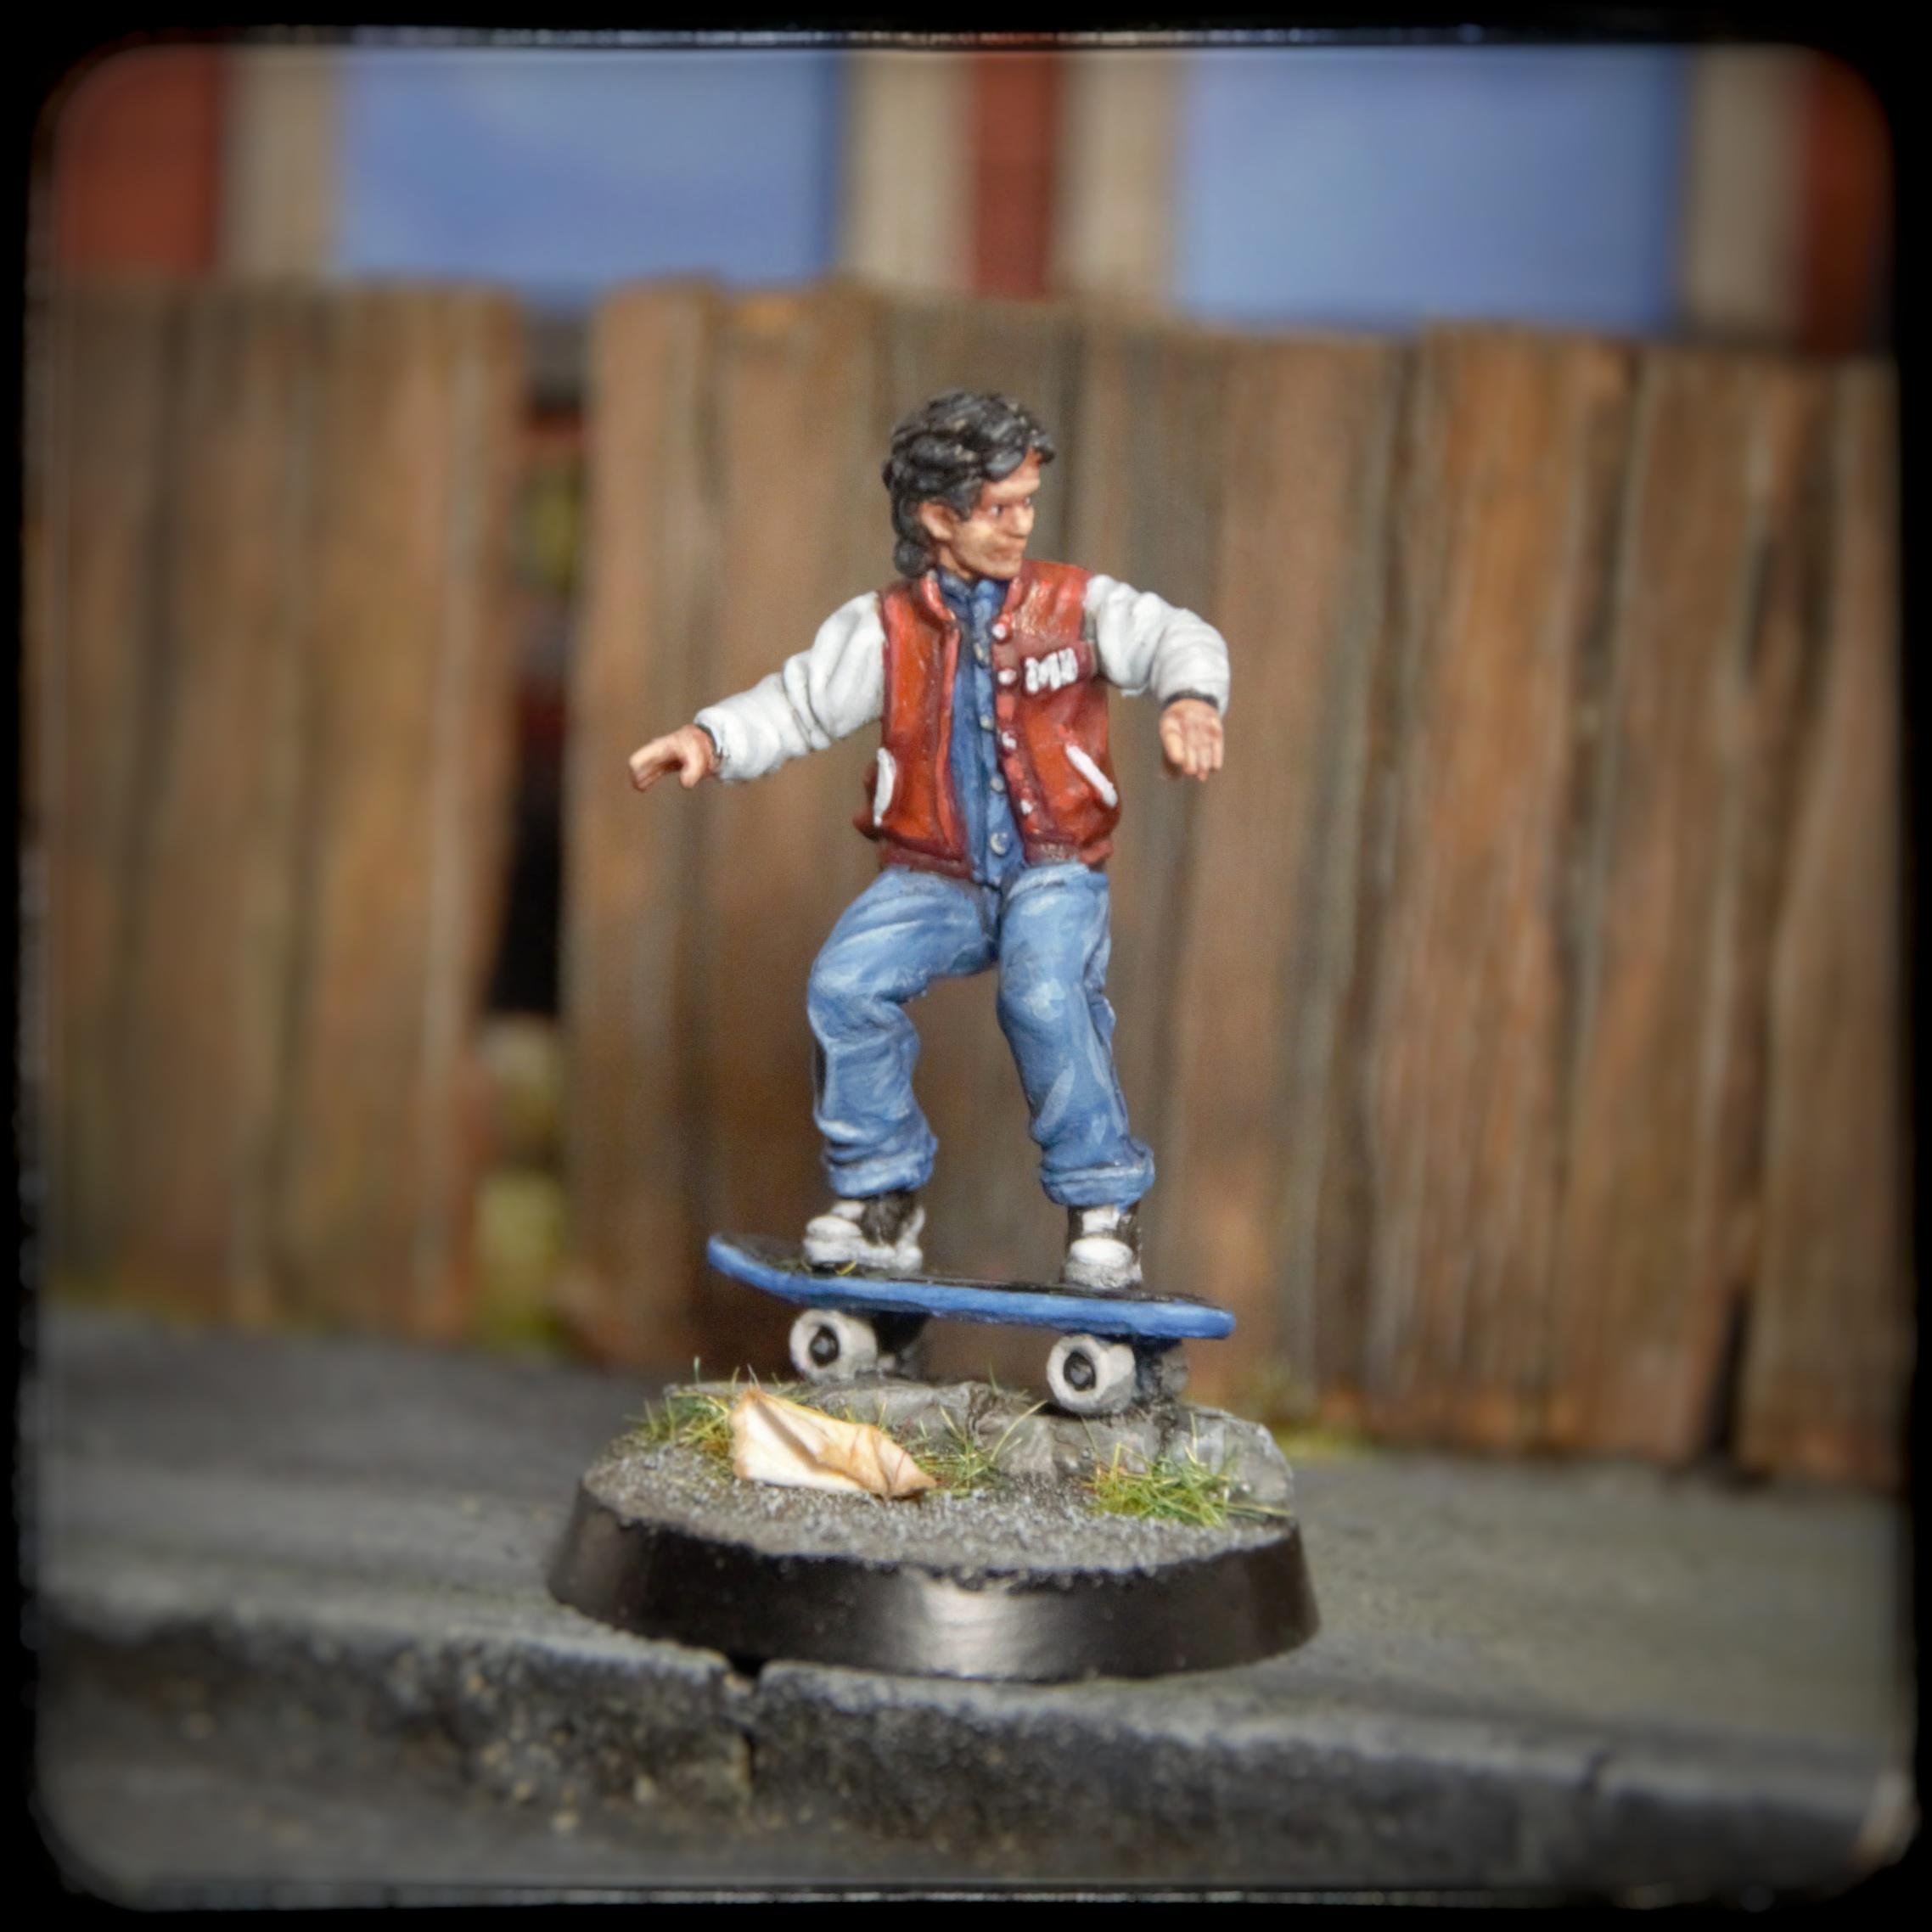 80's Kids on Wheels, Morgue Miniatures